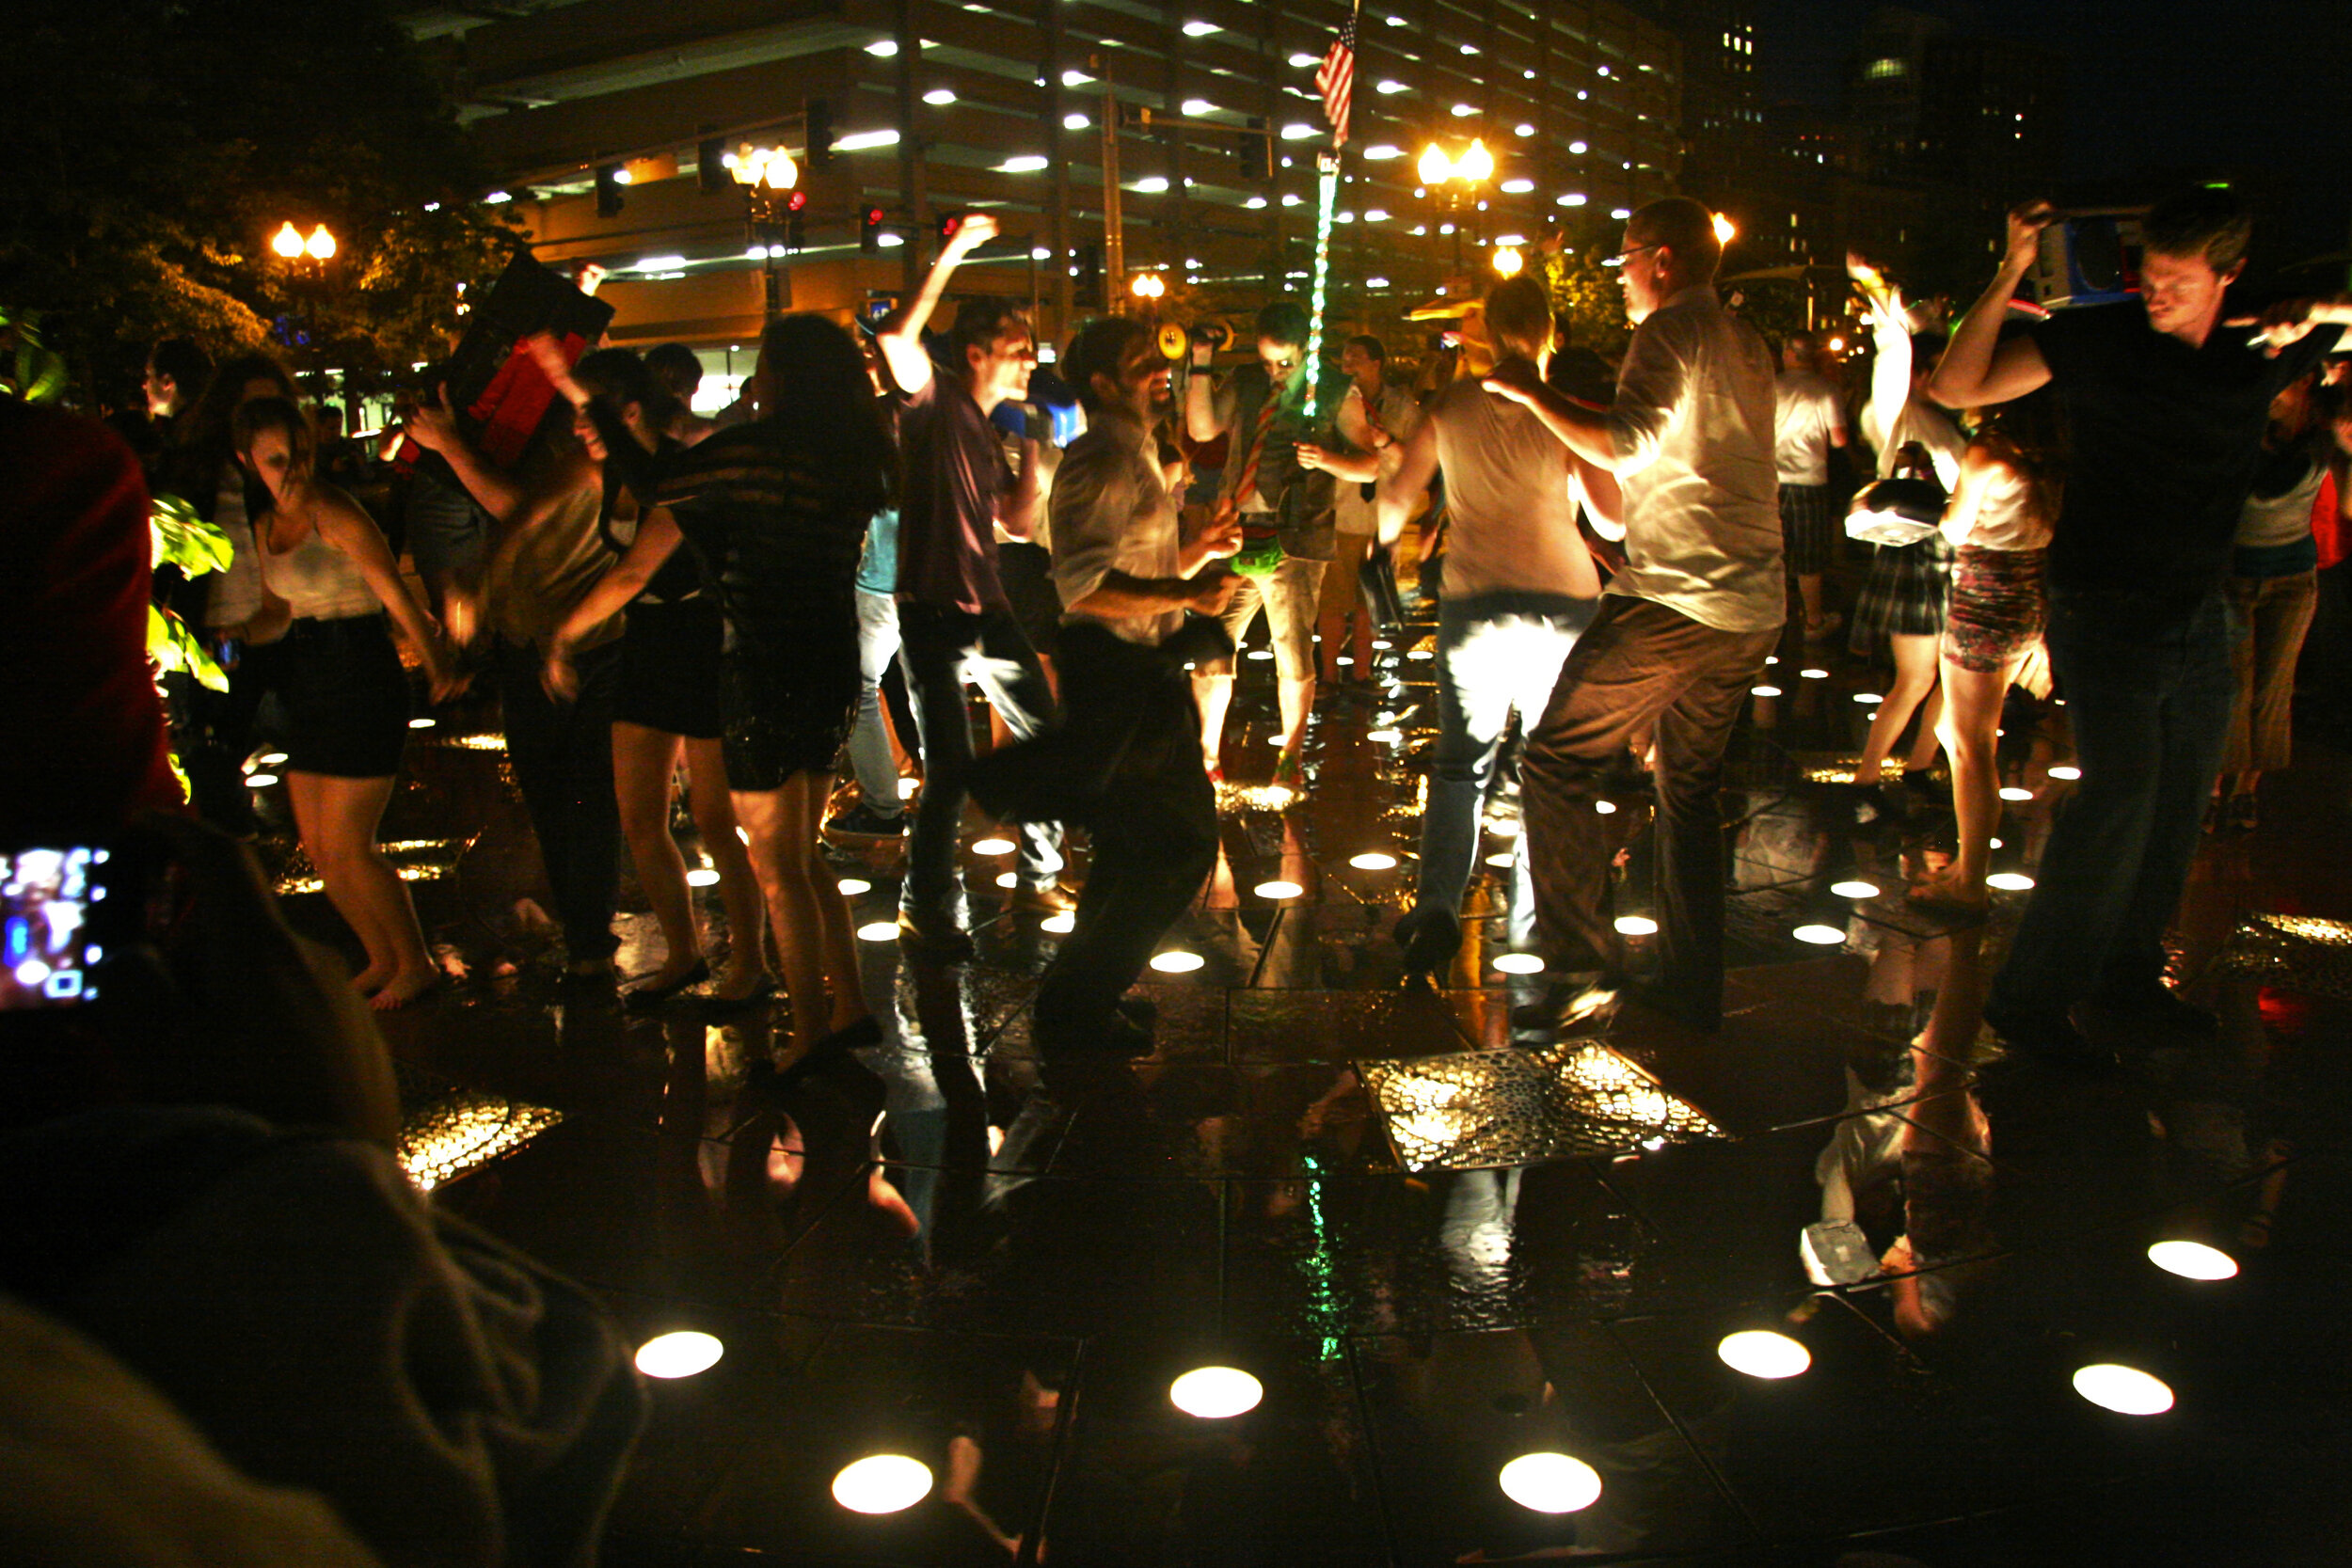 Decentralized Dance Party Boston, 2012